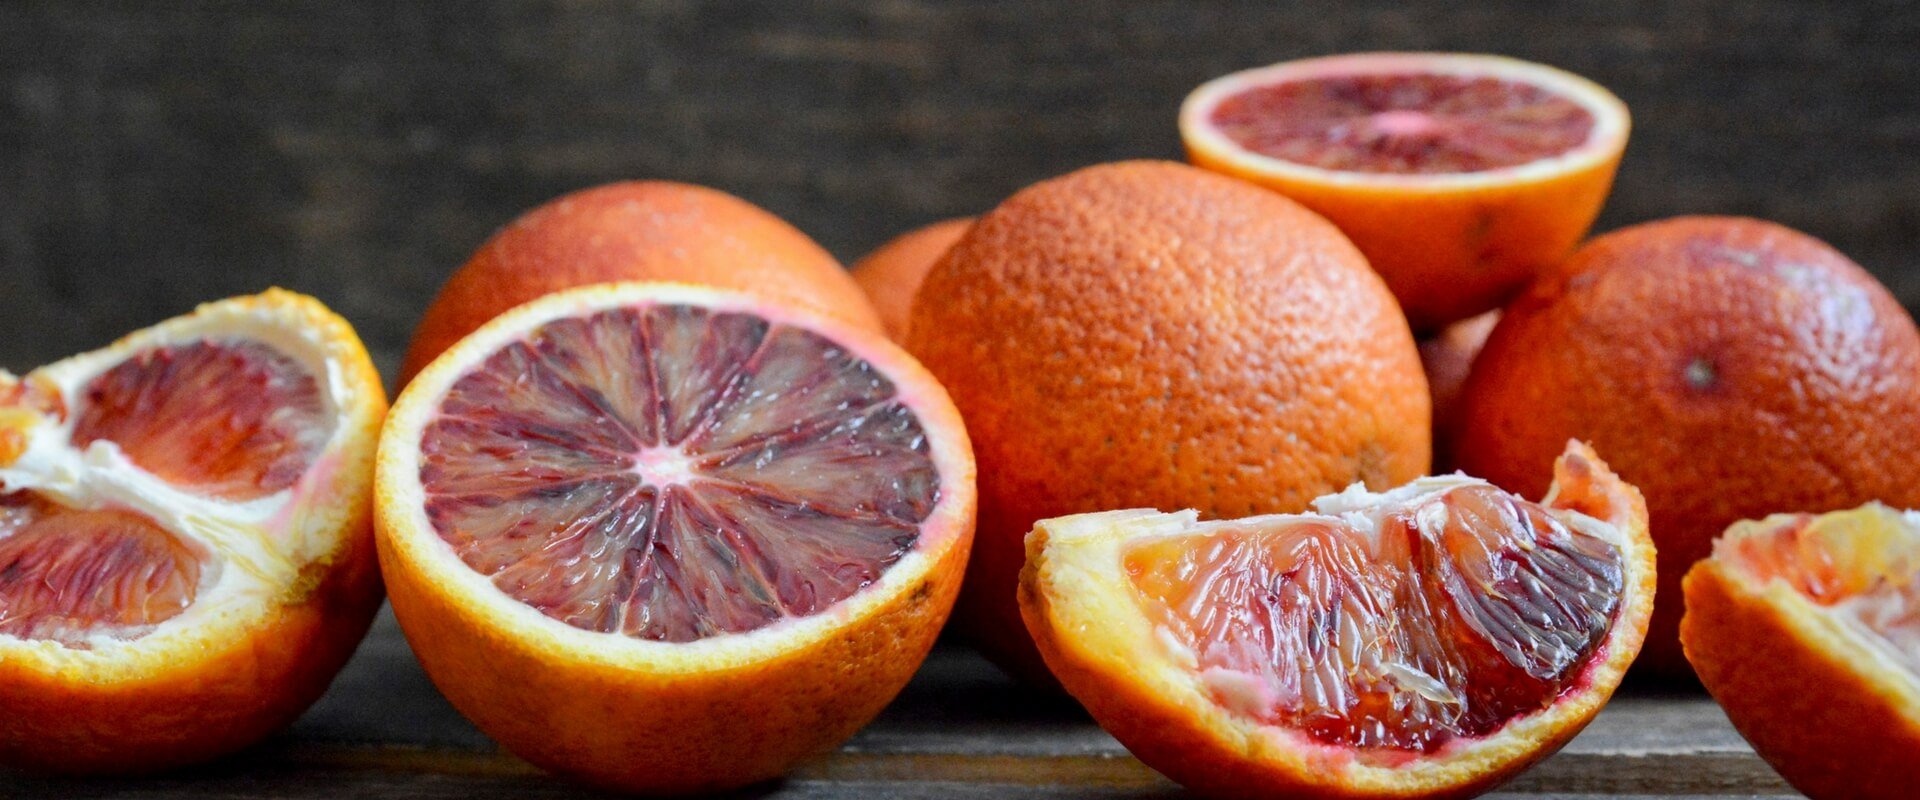 Una spremuta di arancia rossa!